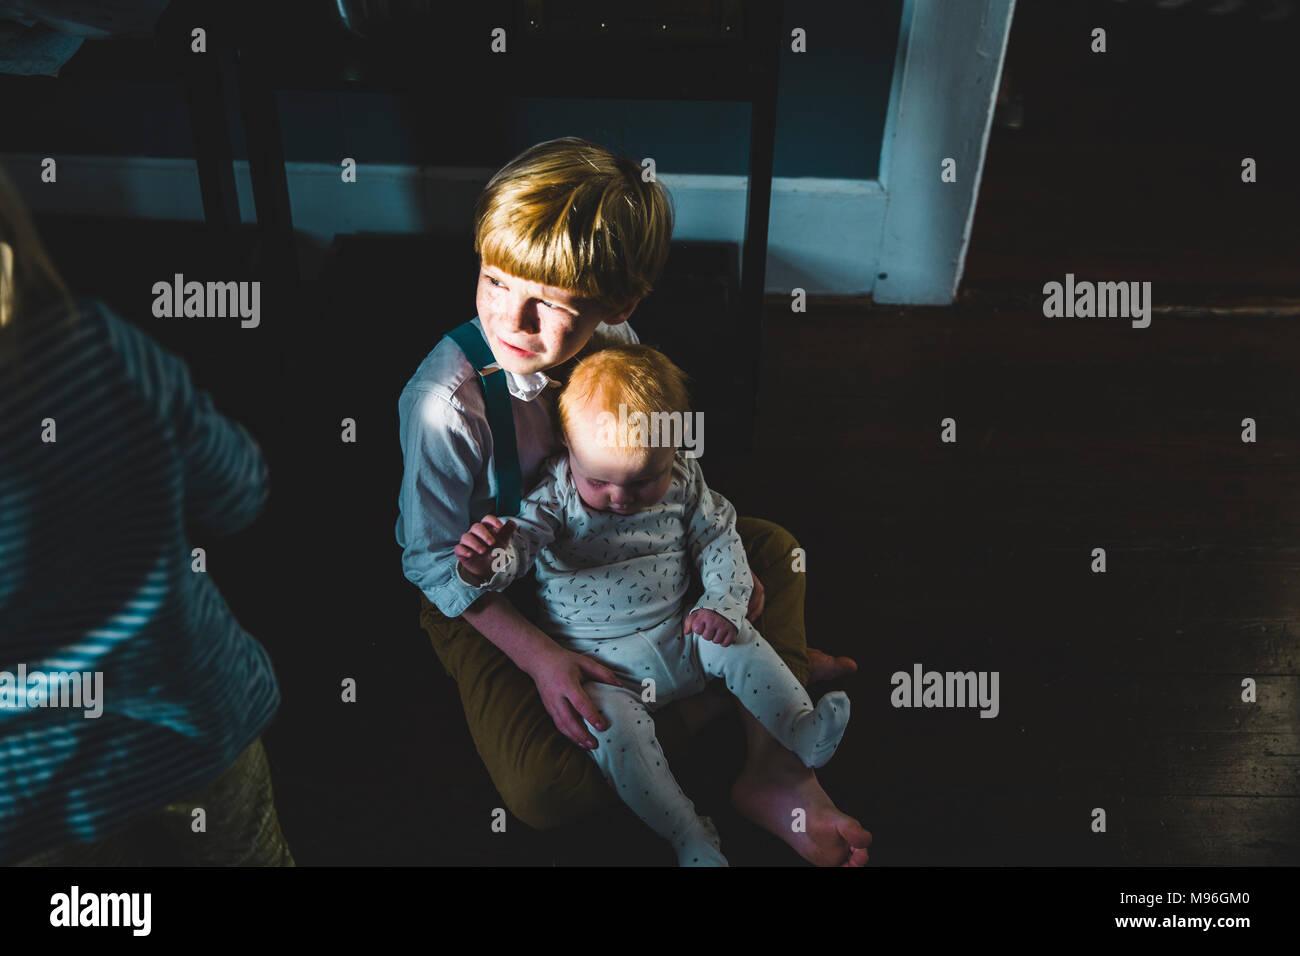 Baby sitting on boy's lap - Stock Image